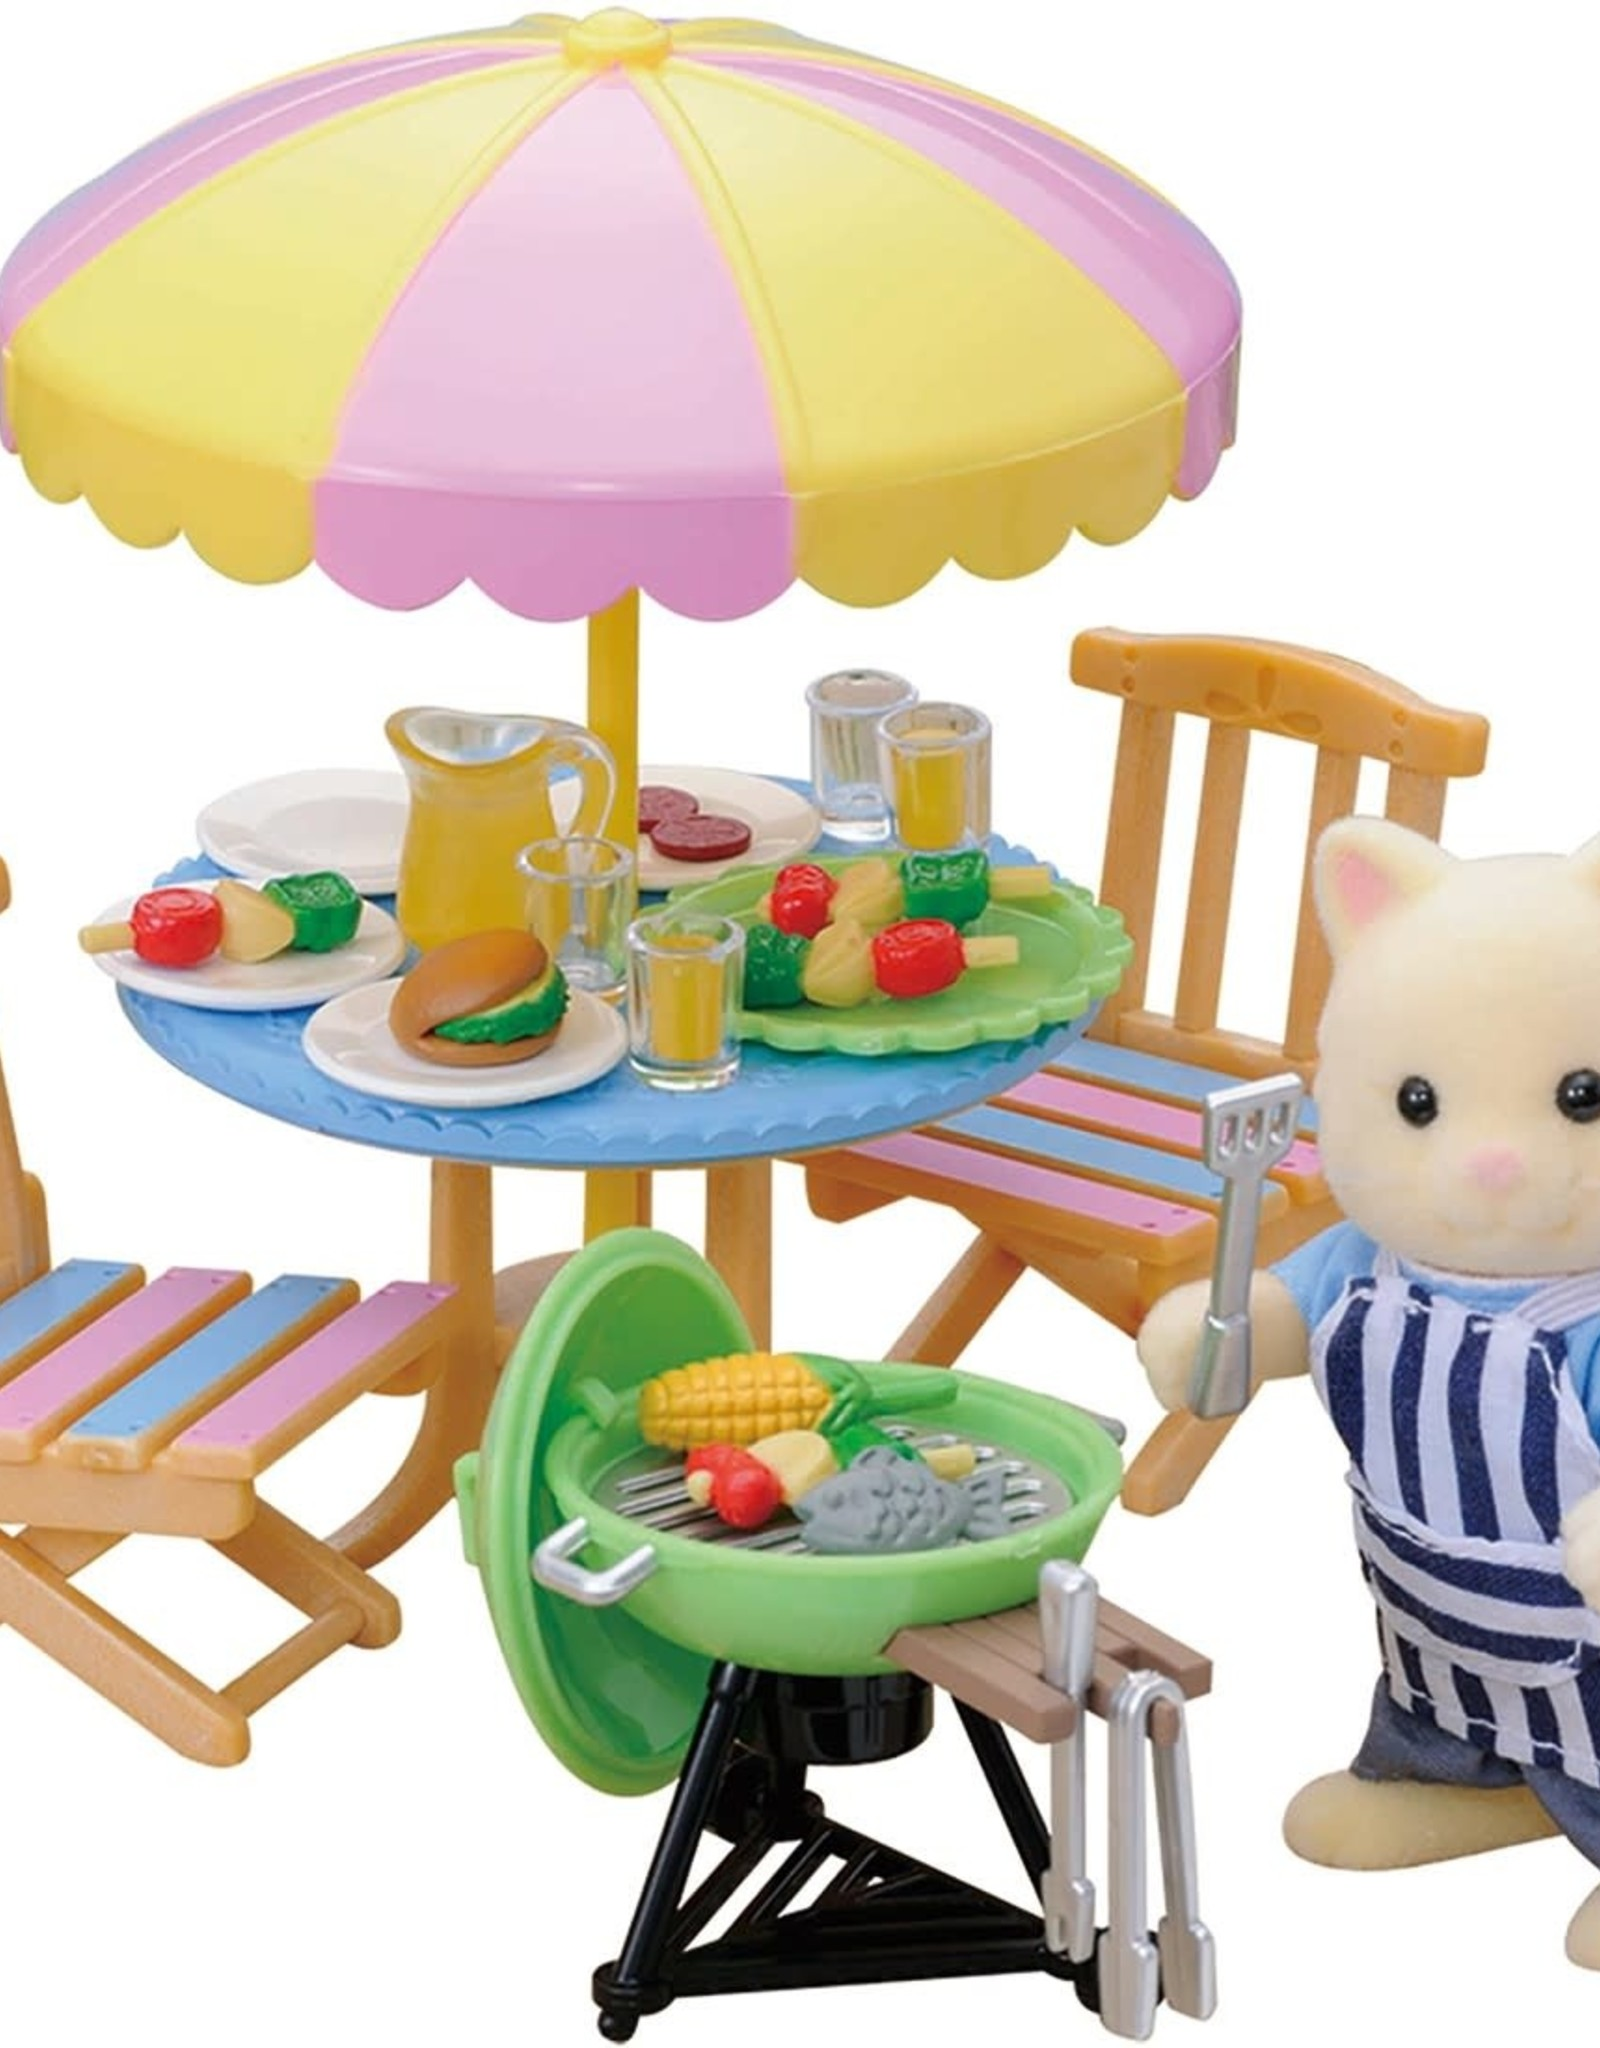 Sylvanian Families Barbecue set